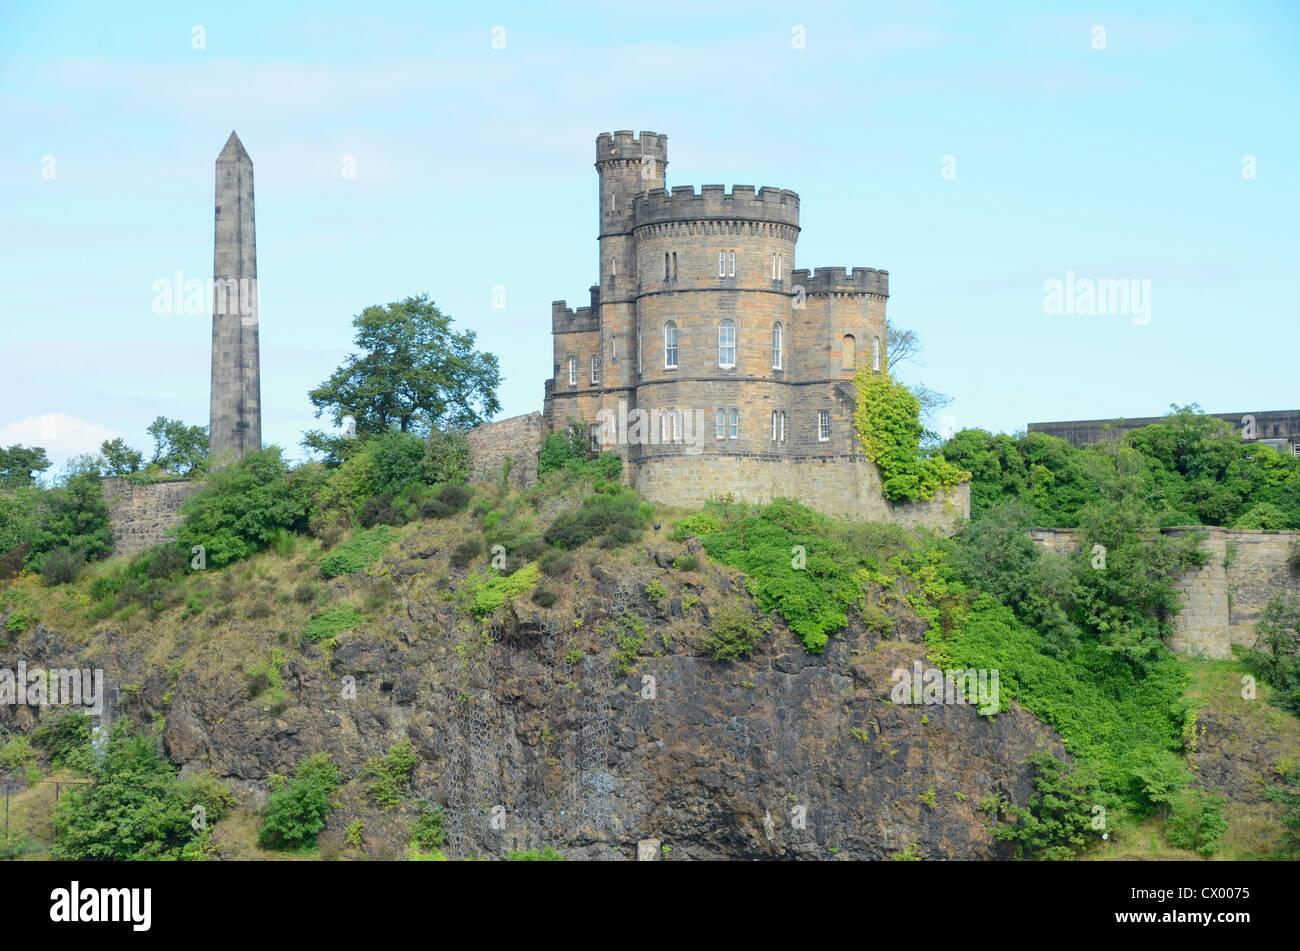 Governor's House and Hamilton Obelisk, Edinburgh, Scotland, UK Stock Photo